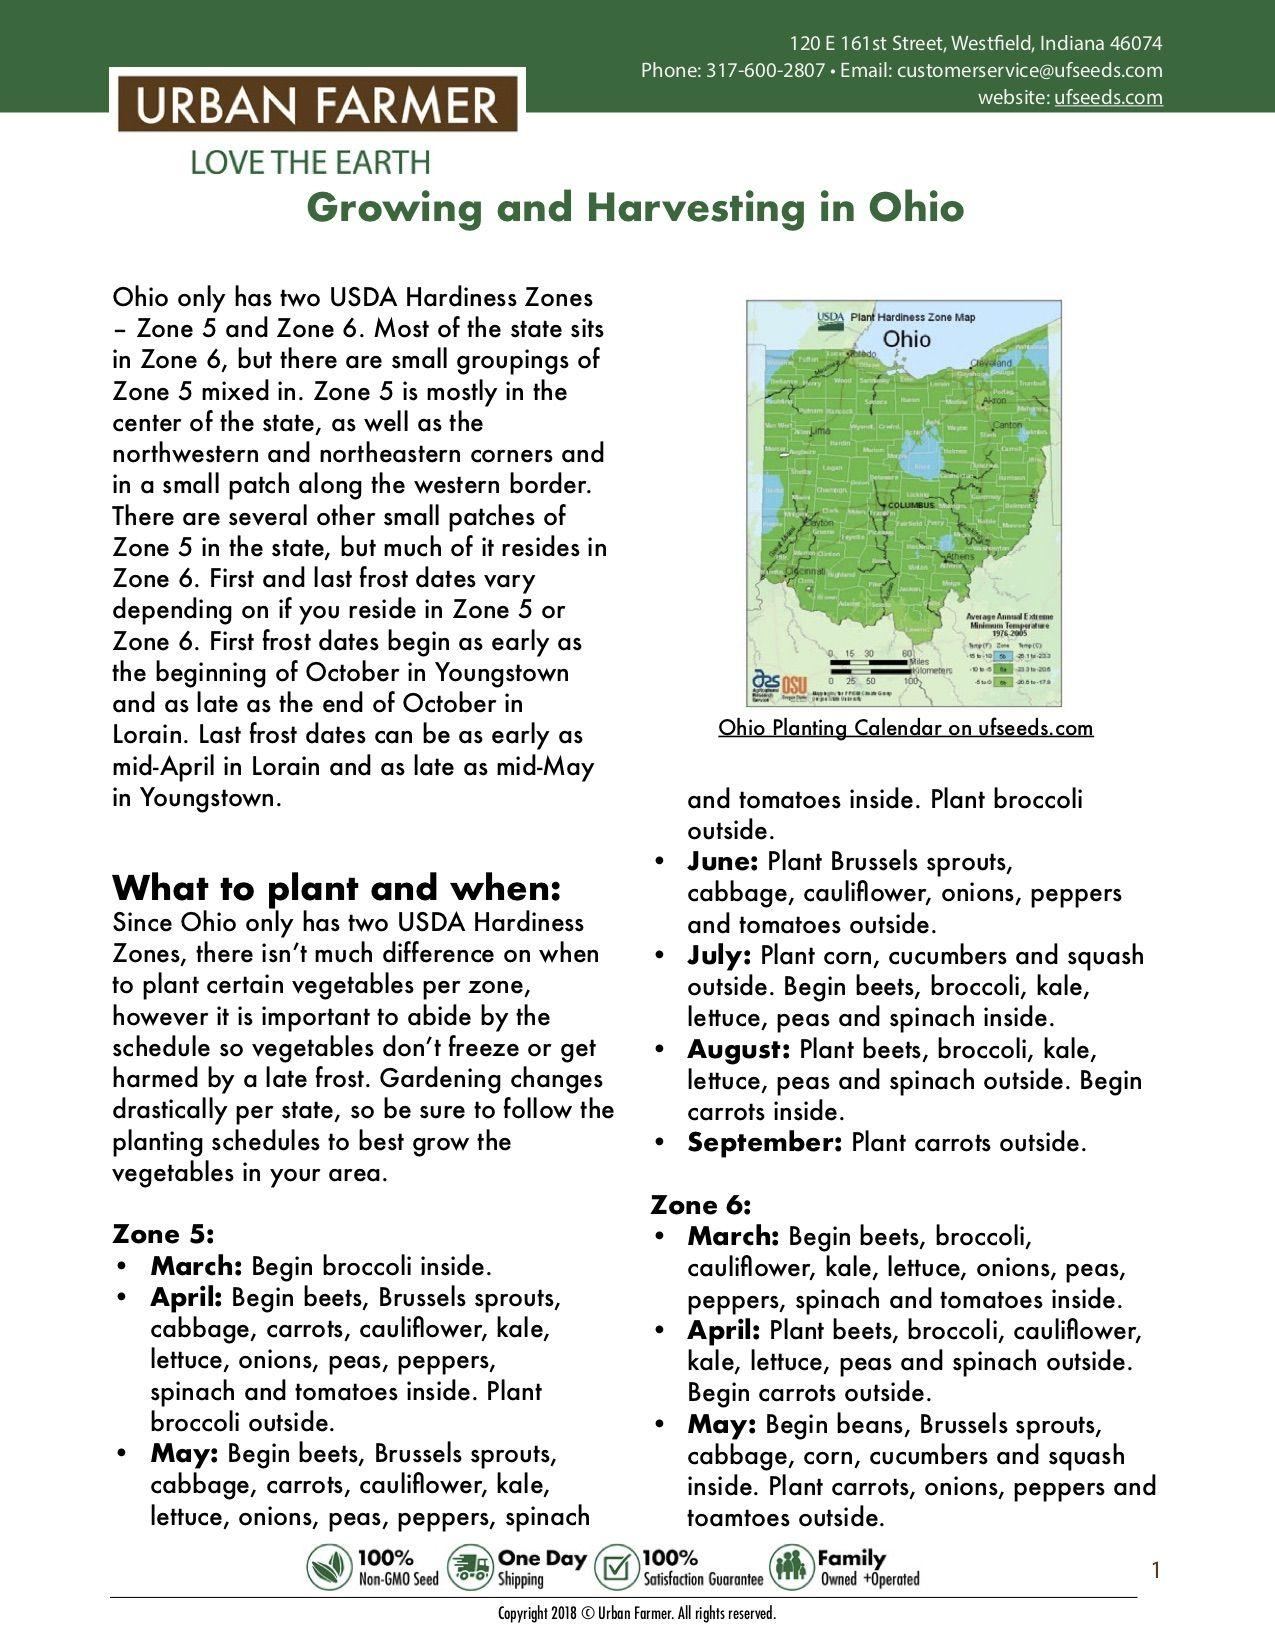 Ohio Vegetable Planting Calendar Planting Calendar Vegetable Planting Calendar Planting Vegetables